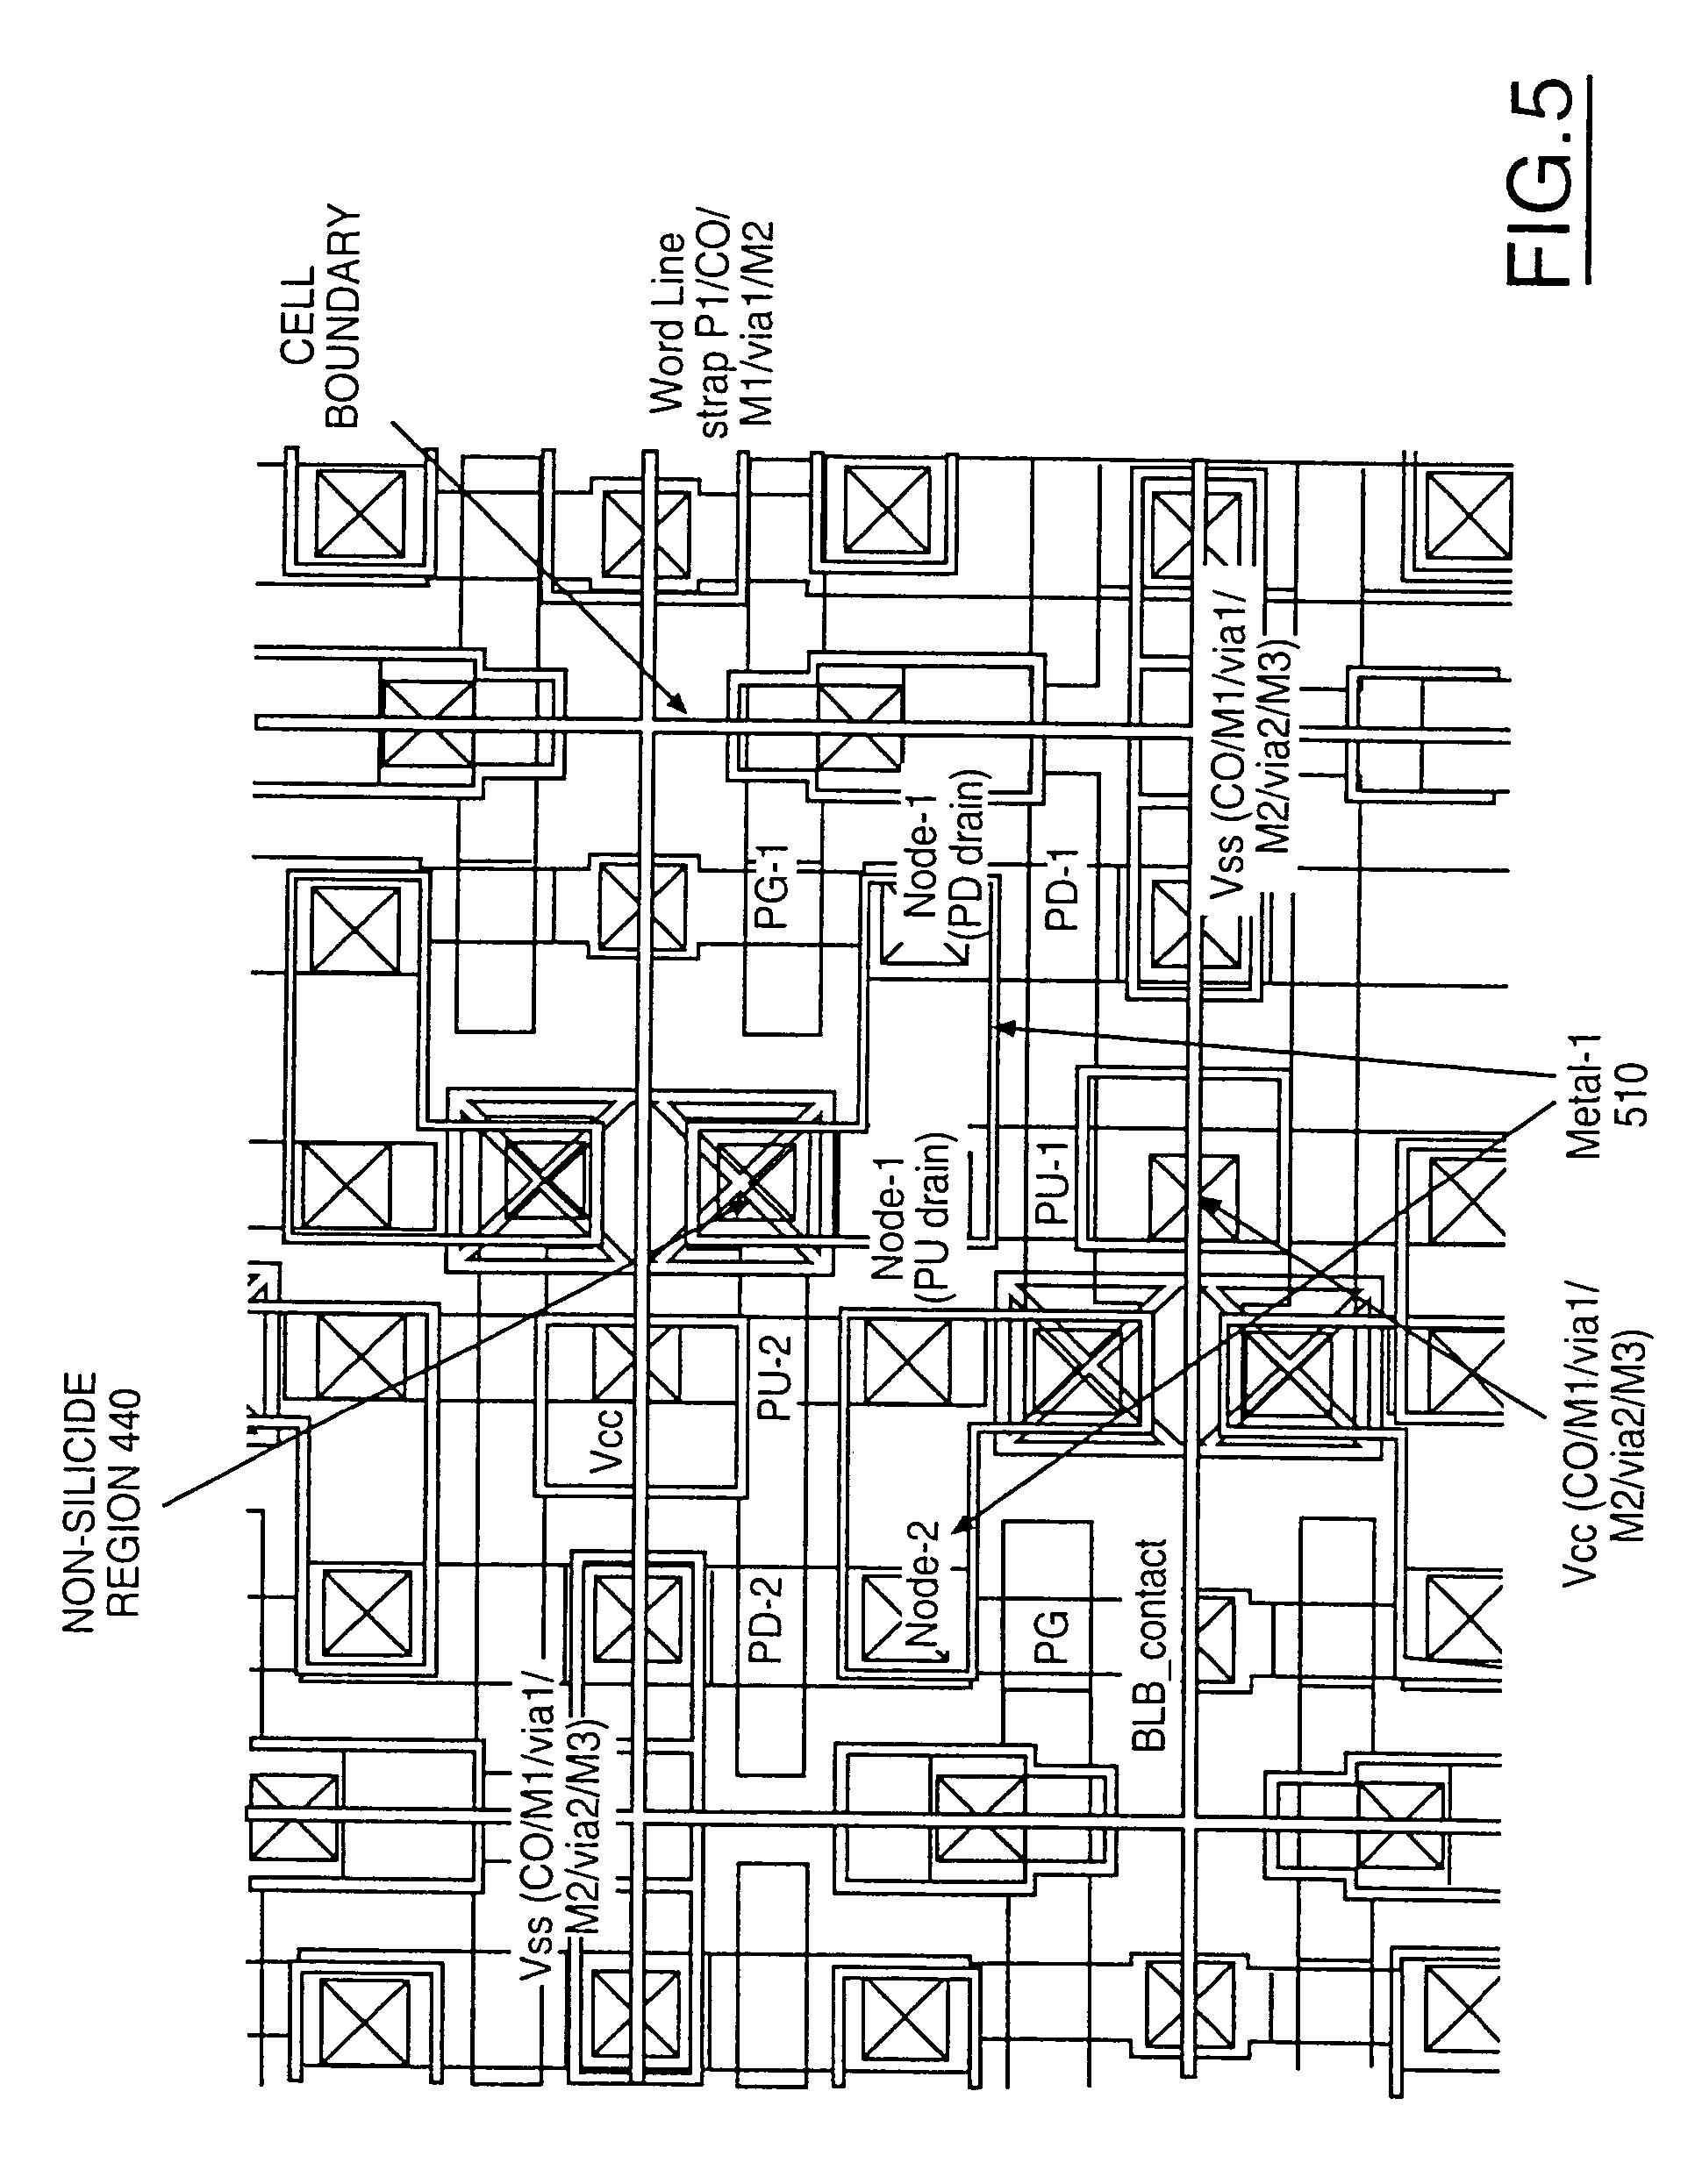 Citroen Saxo Wiring Diagram